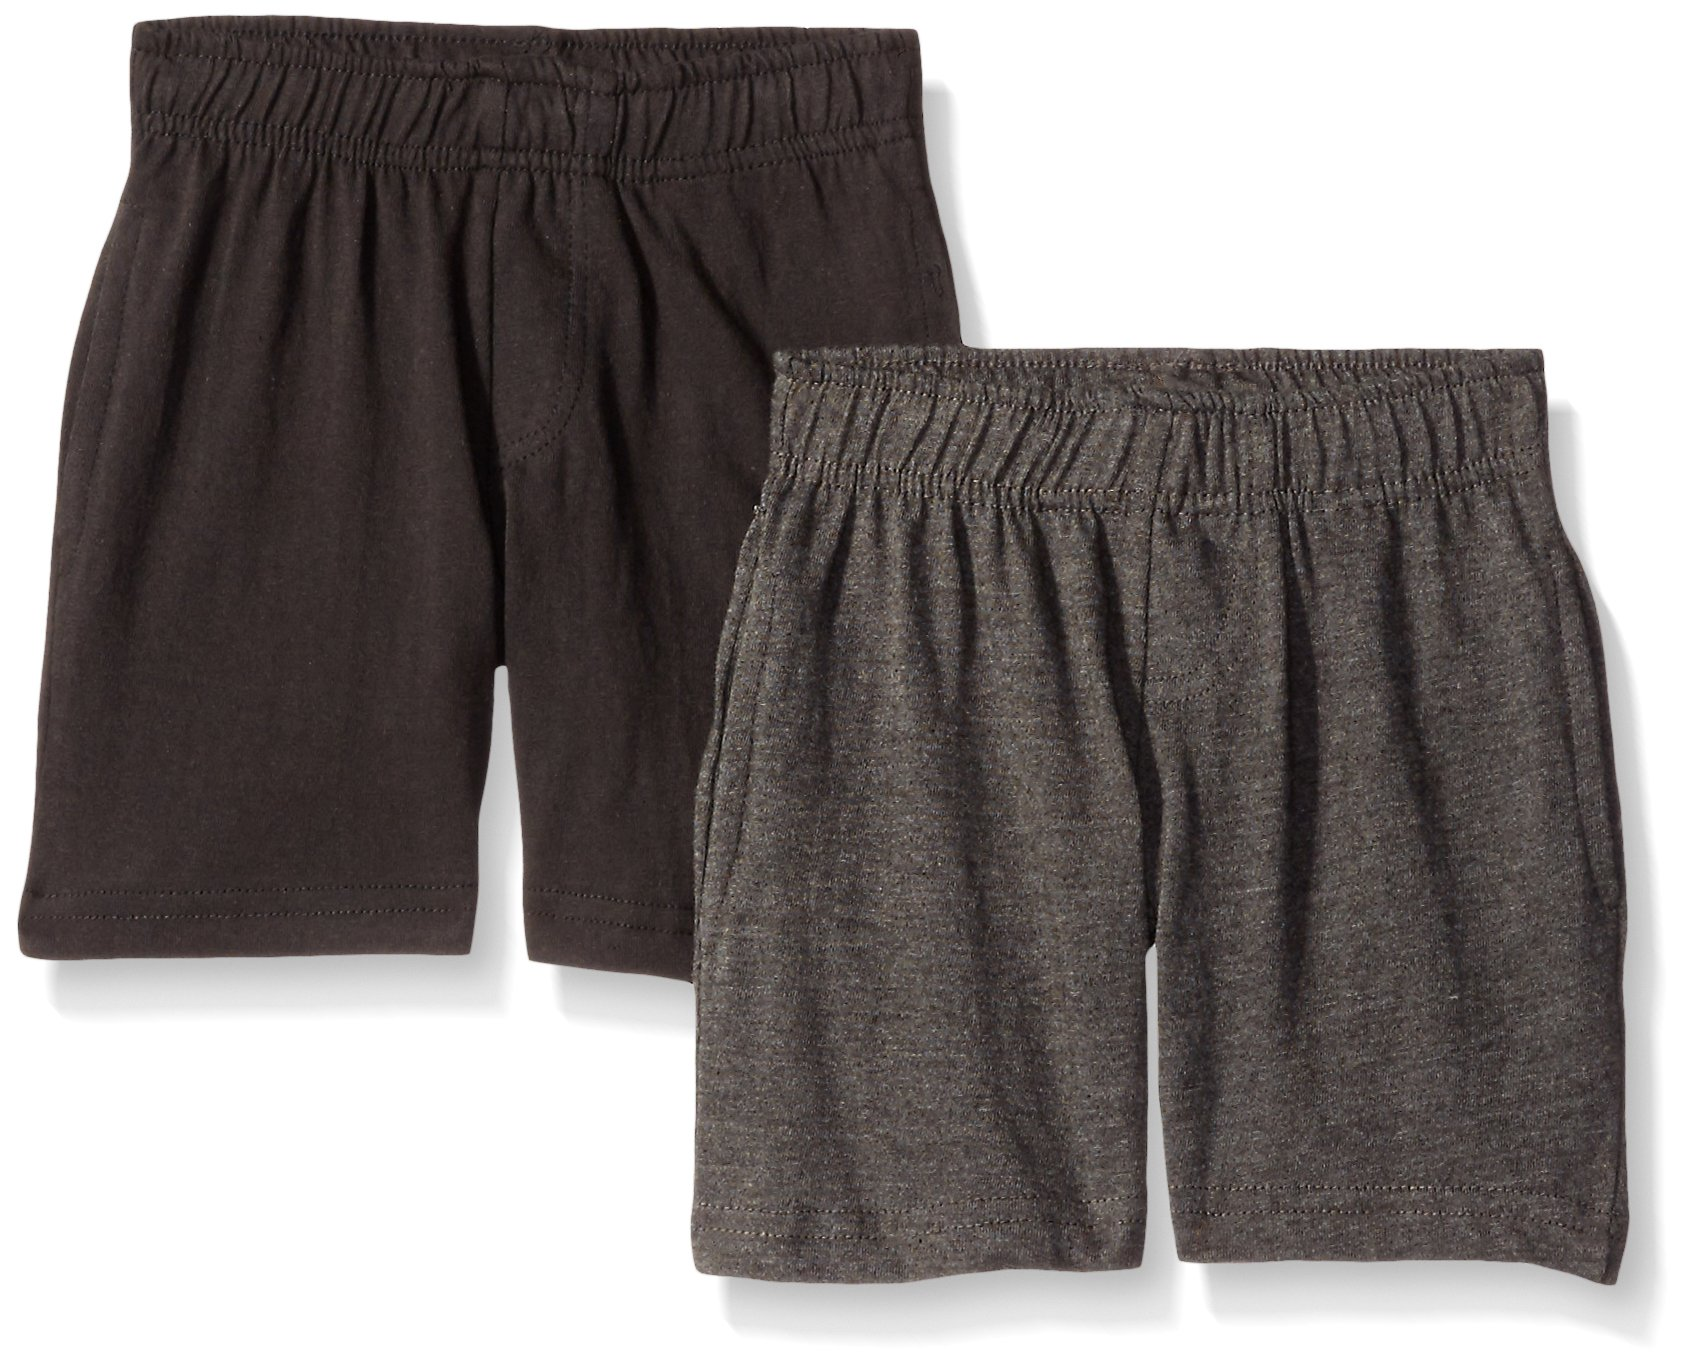 American Hawk Big Boys' 2 Piece Pack Cotton Jersey Shorts, Black/Charcoal, 14/16/Large